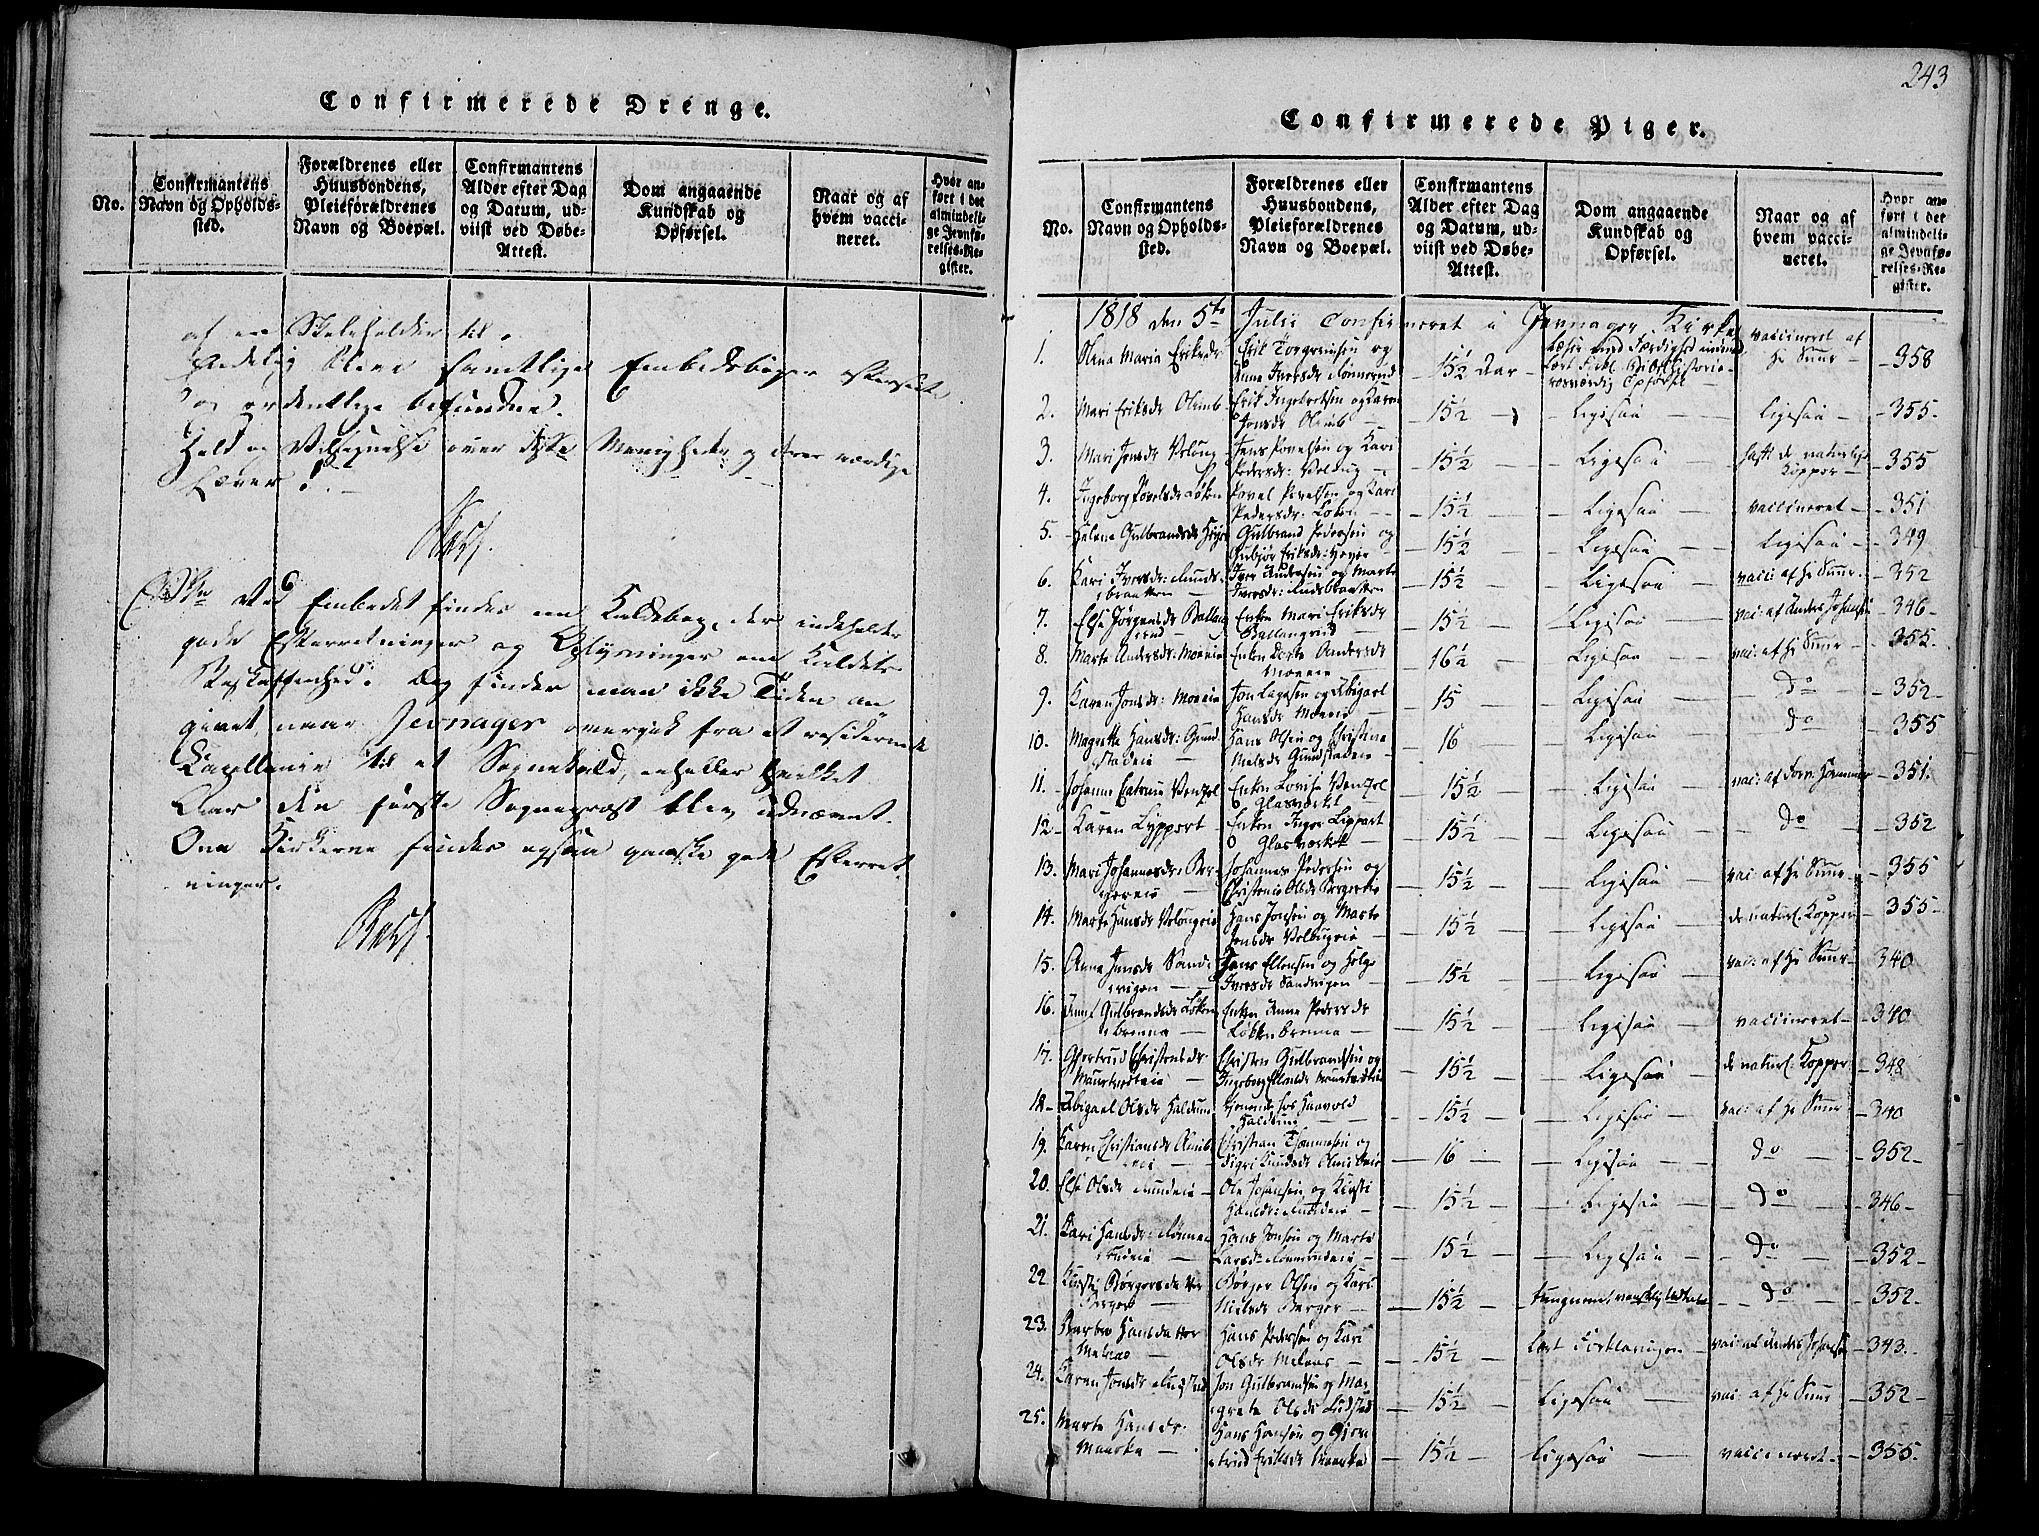 SAH, Jevnaker prestekontor, Ministerialbok nr. 5, 1815-1837, s. 243